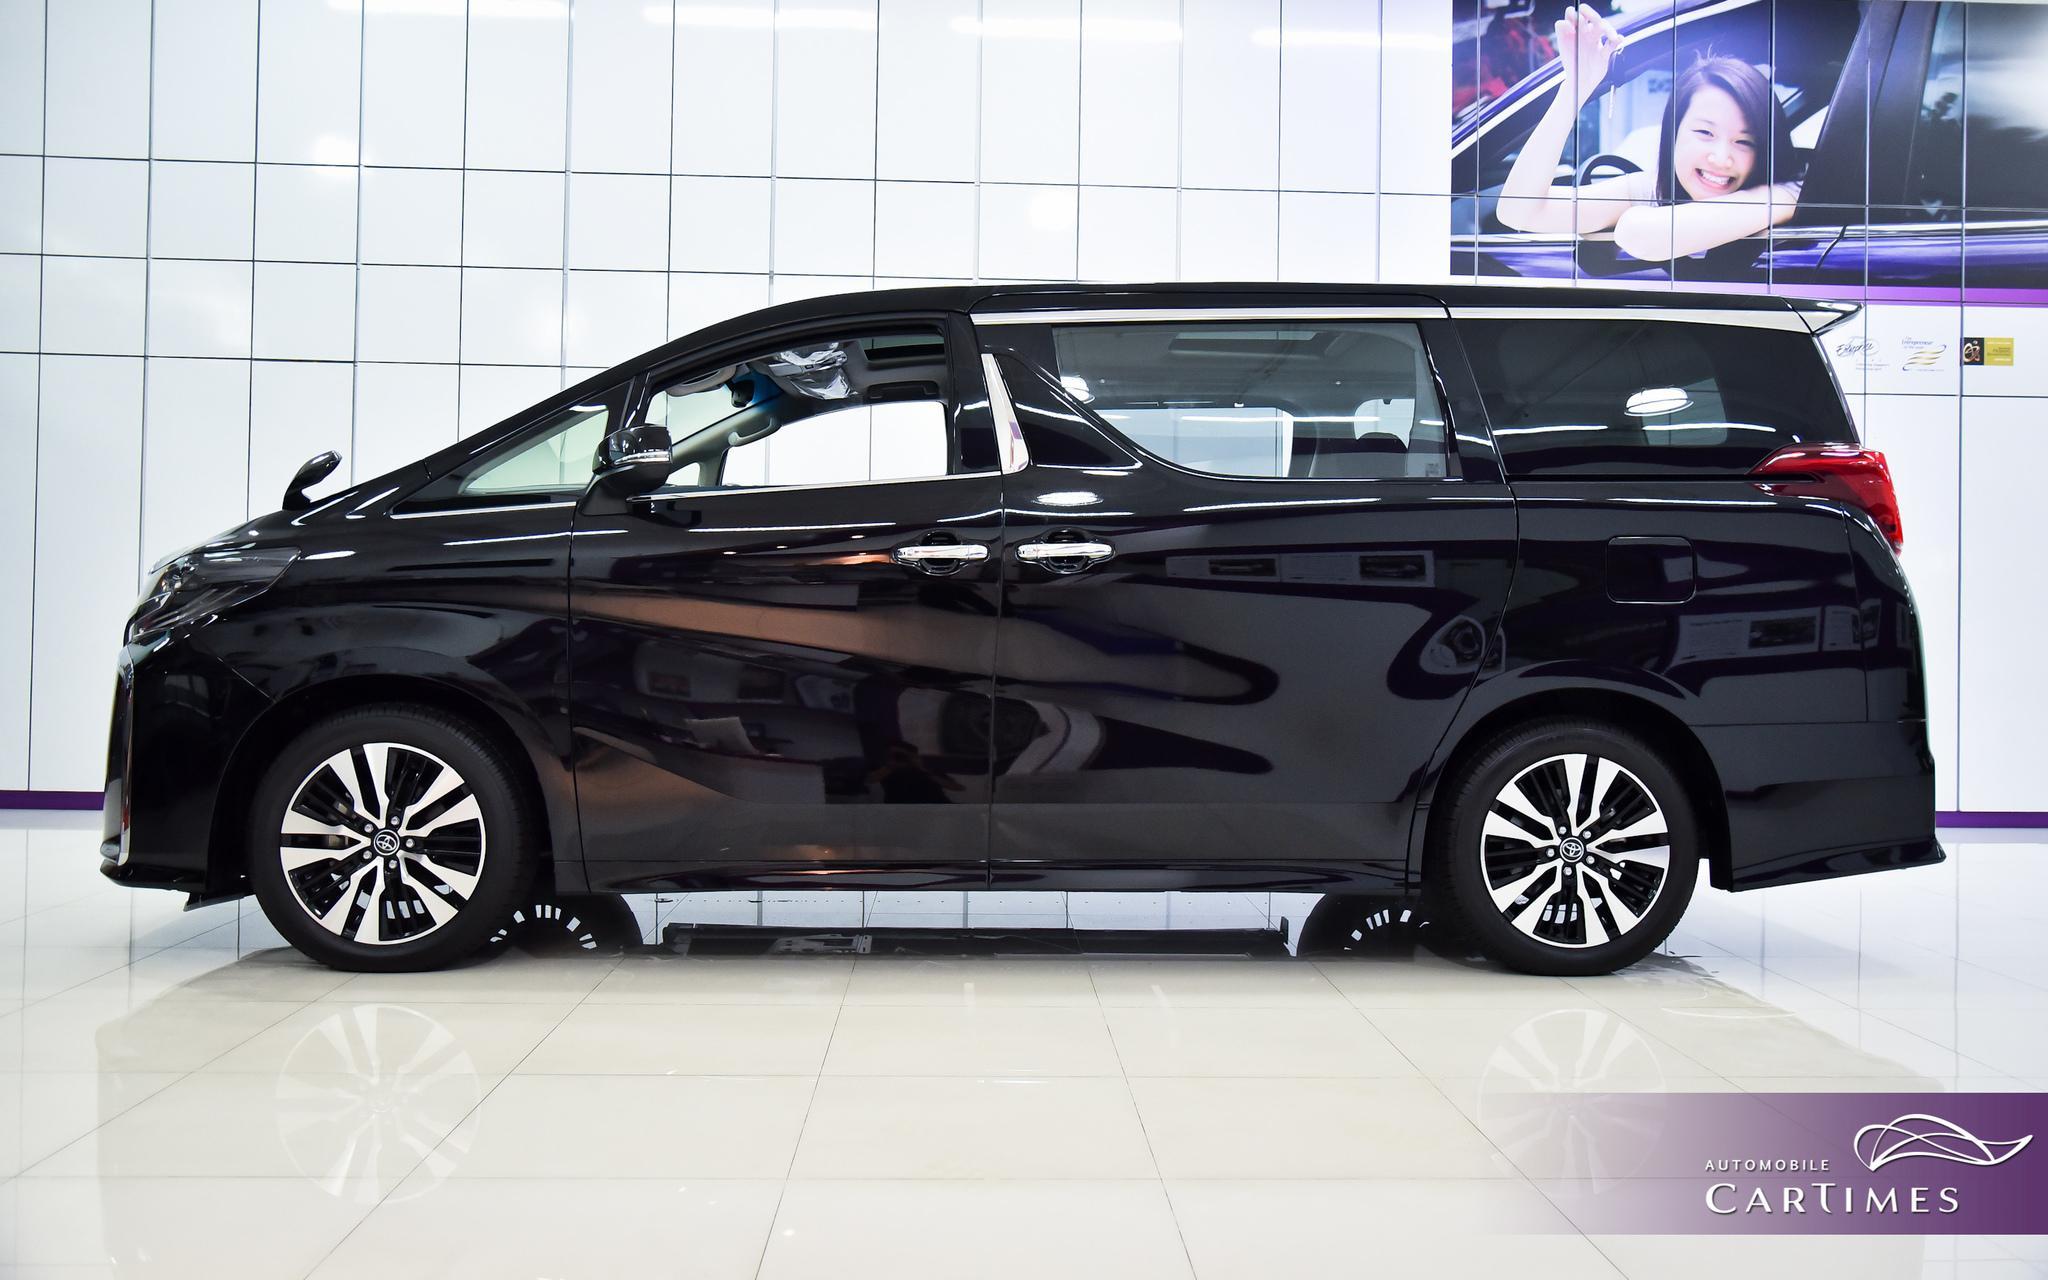 Toyota Alphard 2.5 SC 7-Seater